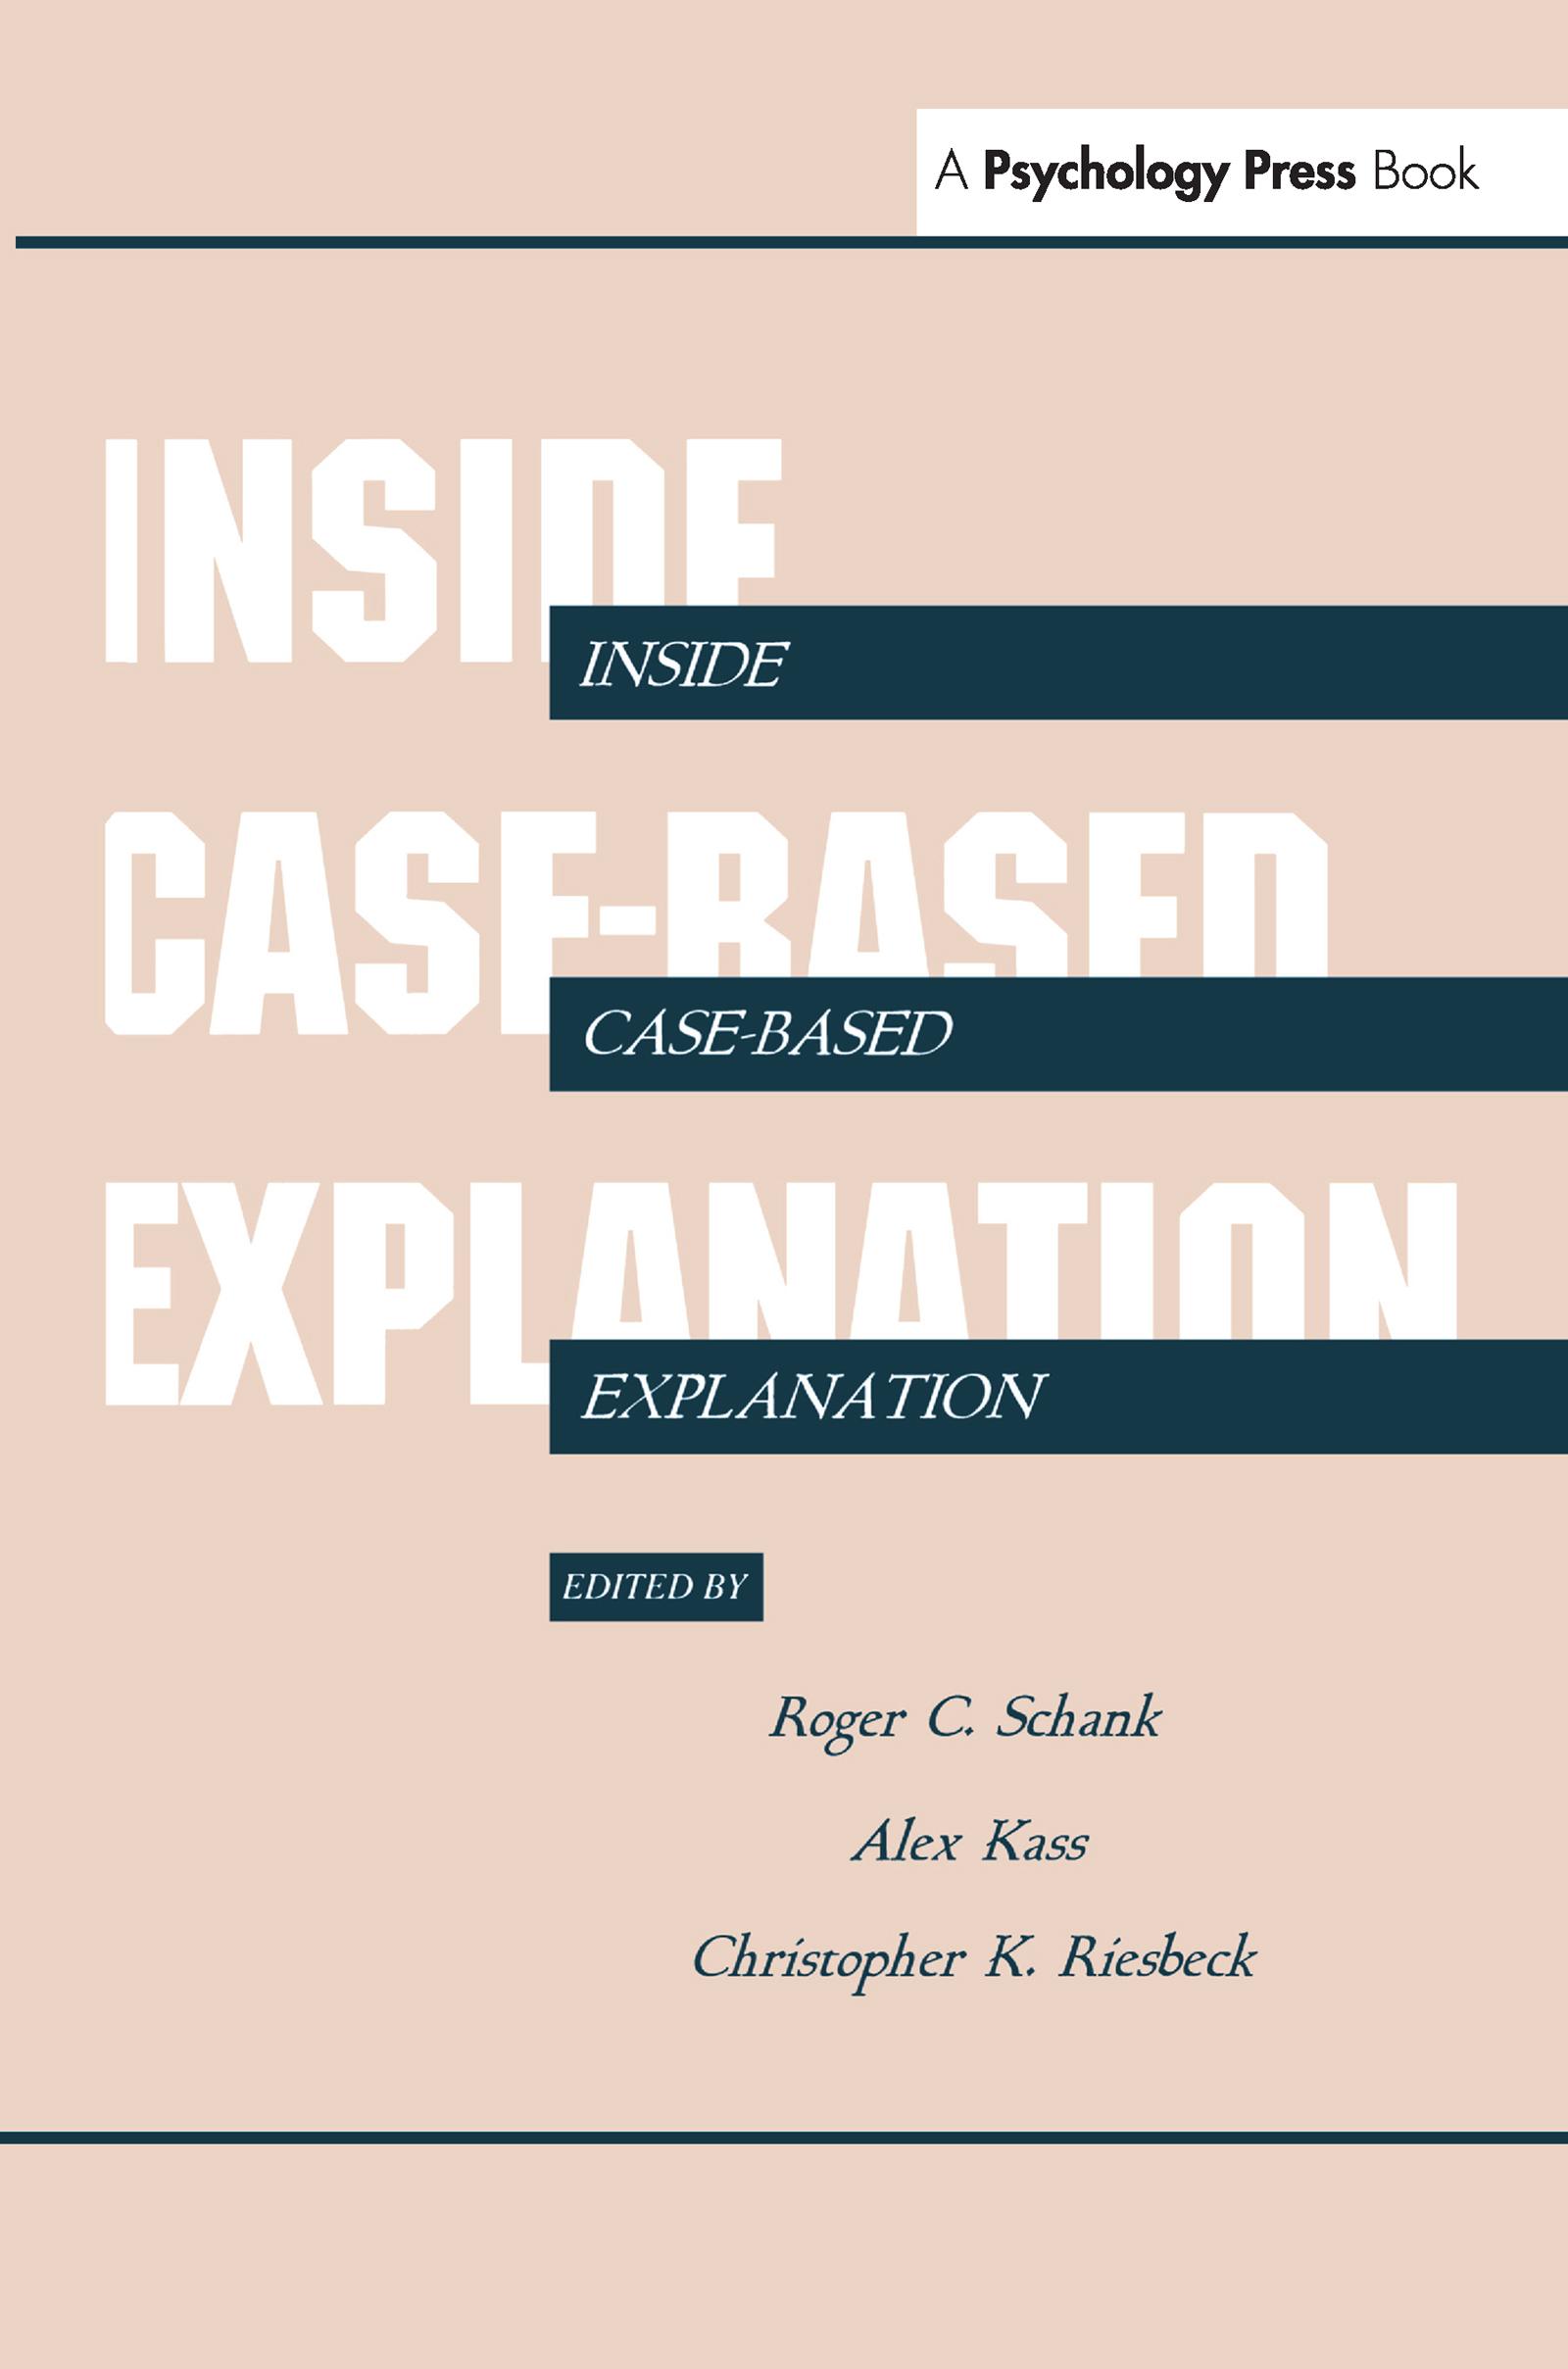 Inside Case-Based Explanation